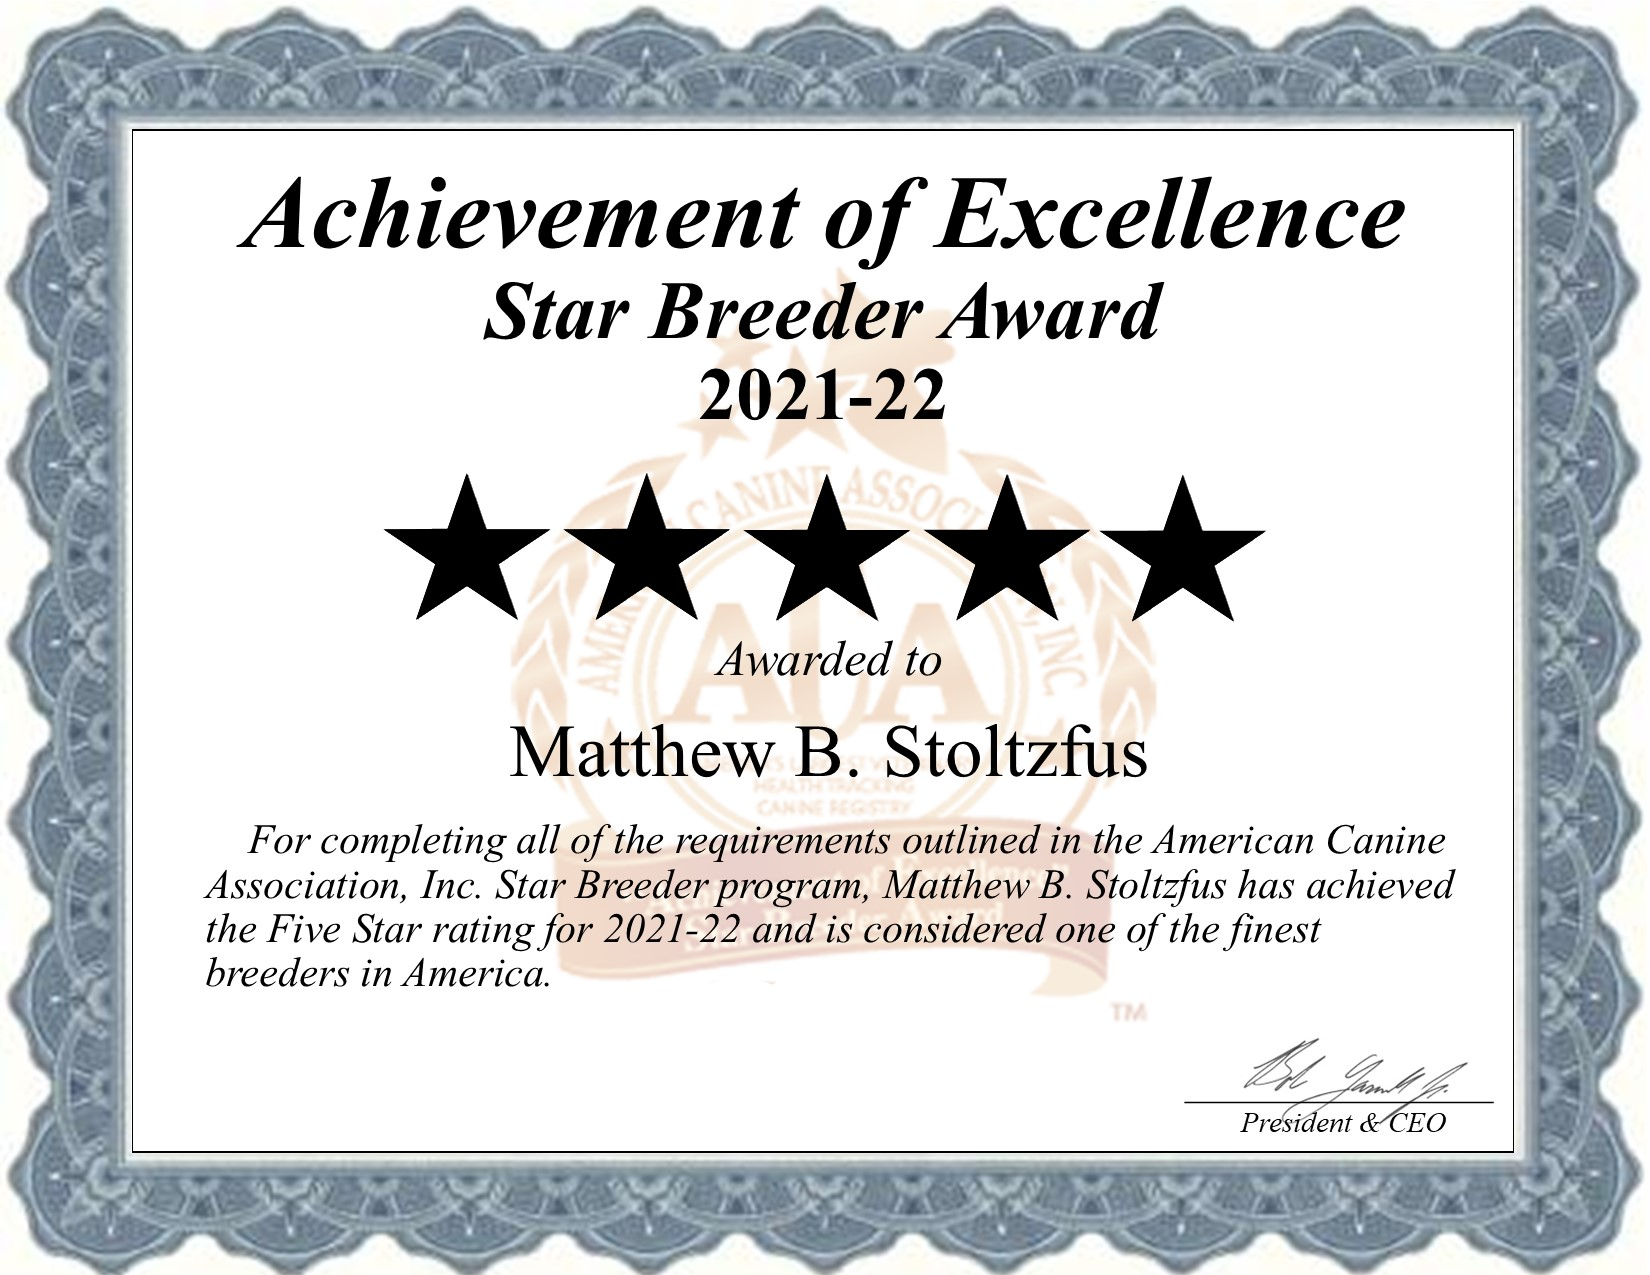 Matthew, Stoltzfus, dog, breeder, star, certificate, Matthew-Stoltzfus, Gap, PA, Pennsylvania, puppy, dog, kennels, mill, puppymill, usda, 5-star, aca, ica, registered, bernadoodle